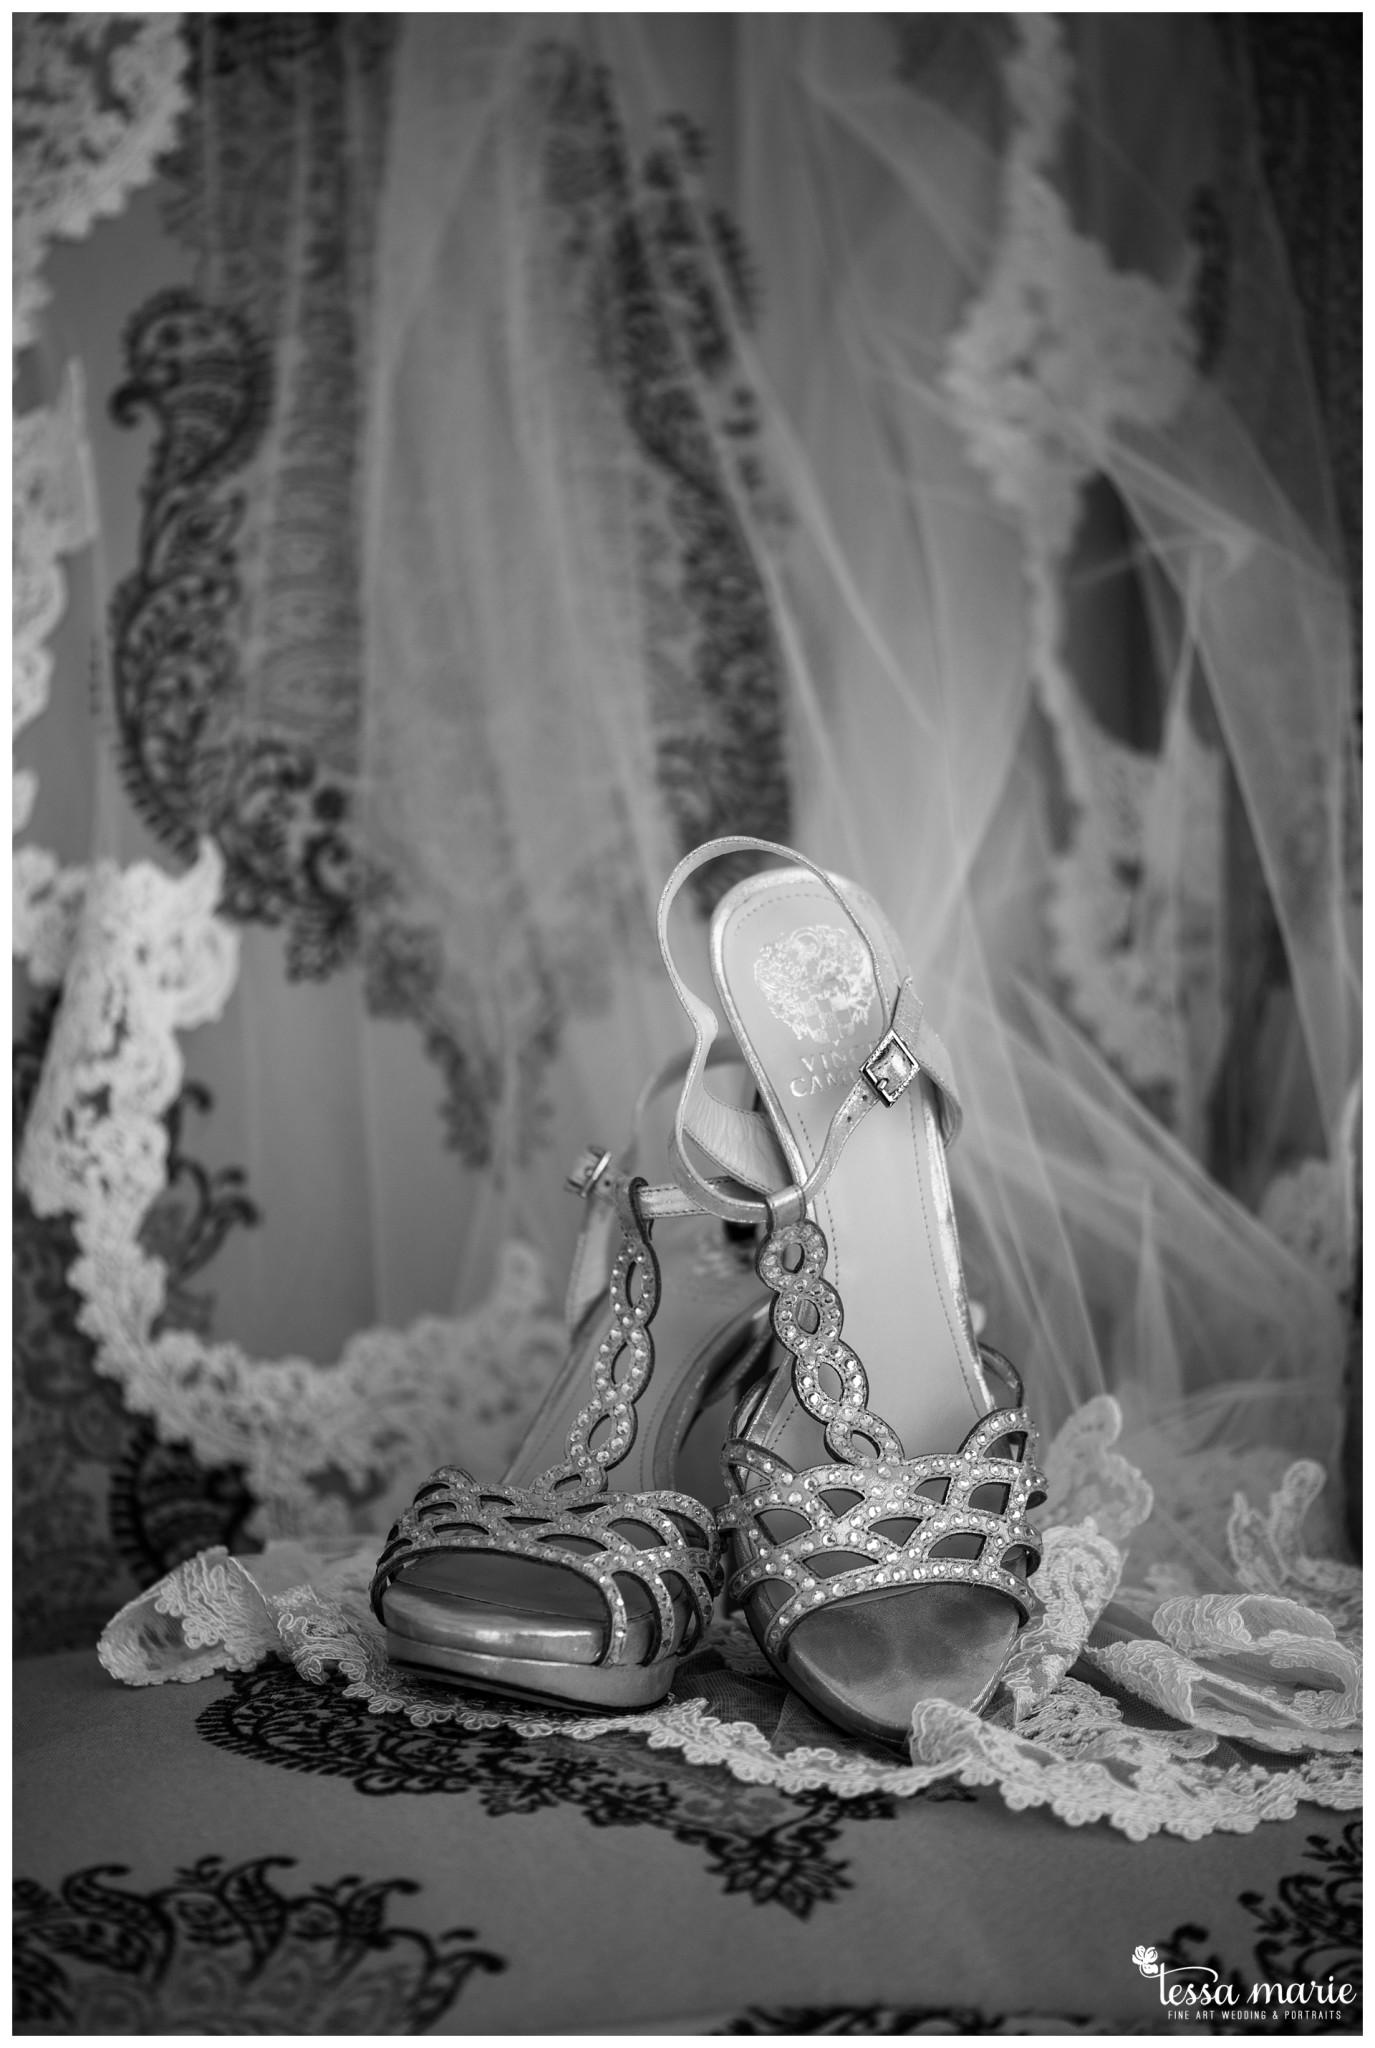 tessa_marie_weddings_legacy_story_focused_wedding_pictures_atlanta_wedding_photographer_0058